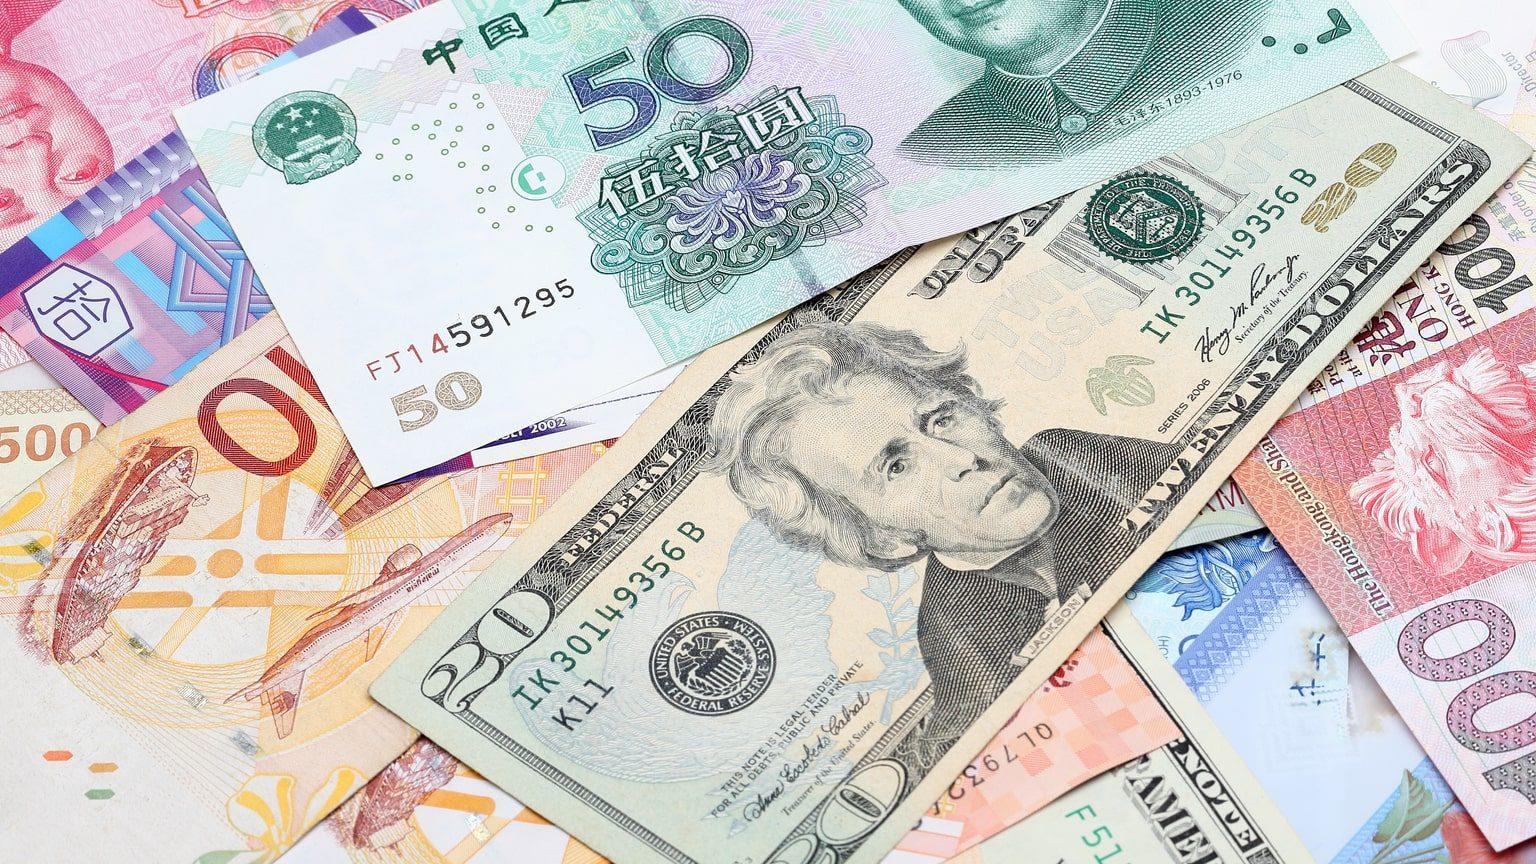 Colourful hong kong currency